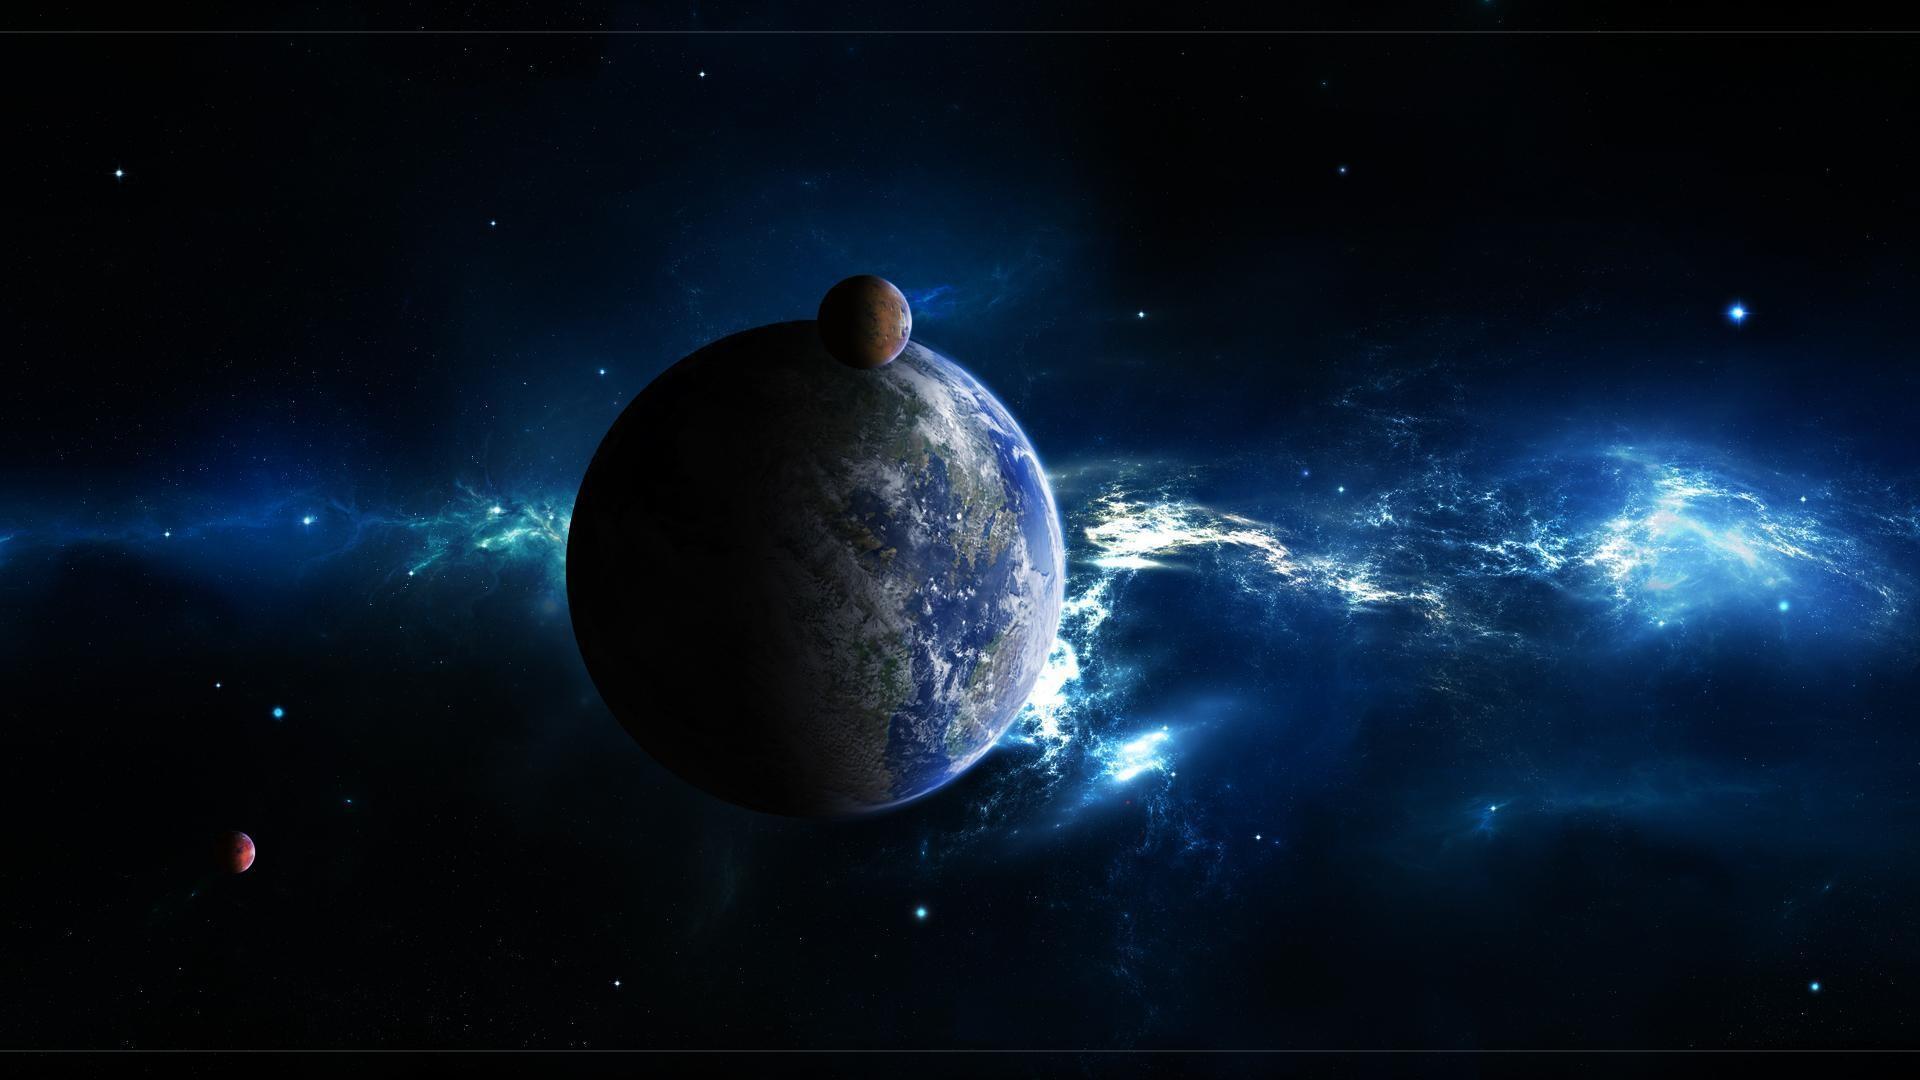 Free Outer Space Desktop Backgrounds Wallpaper | WallpaperPC